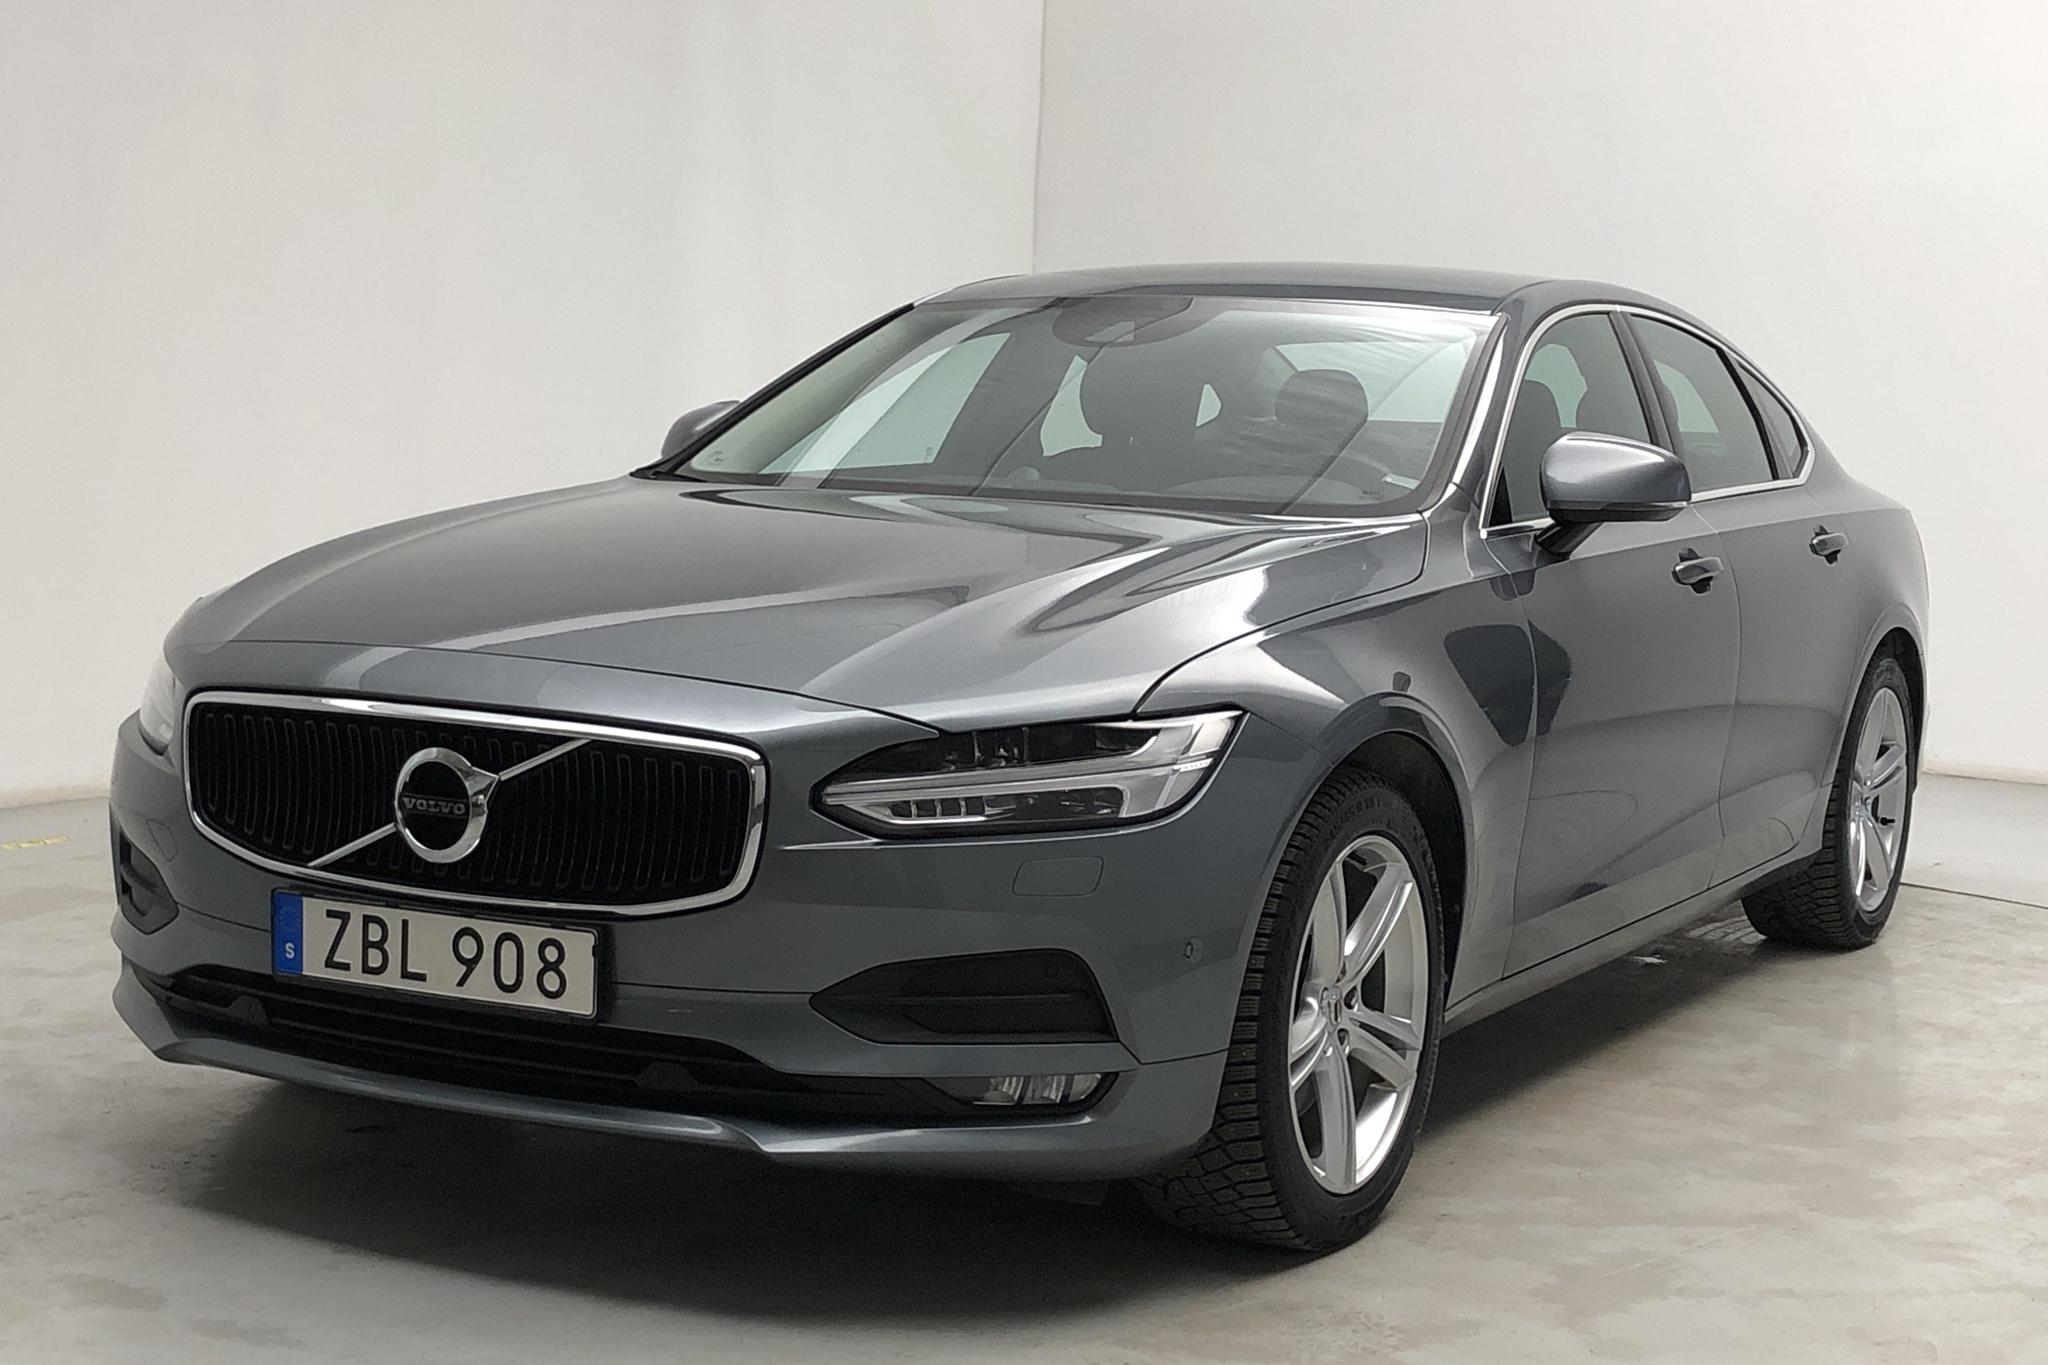 Volvo S90 D4 (190hk) - 8 951 mil - Automat - grå - 2018